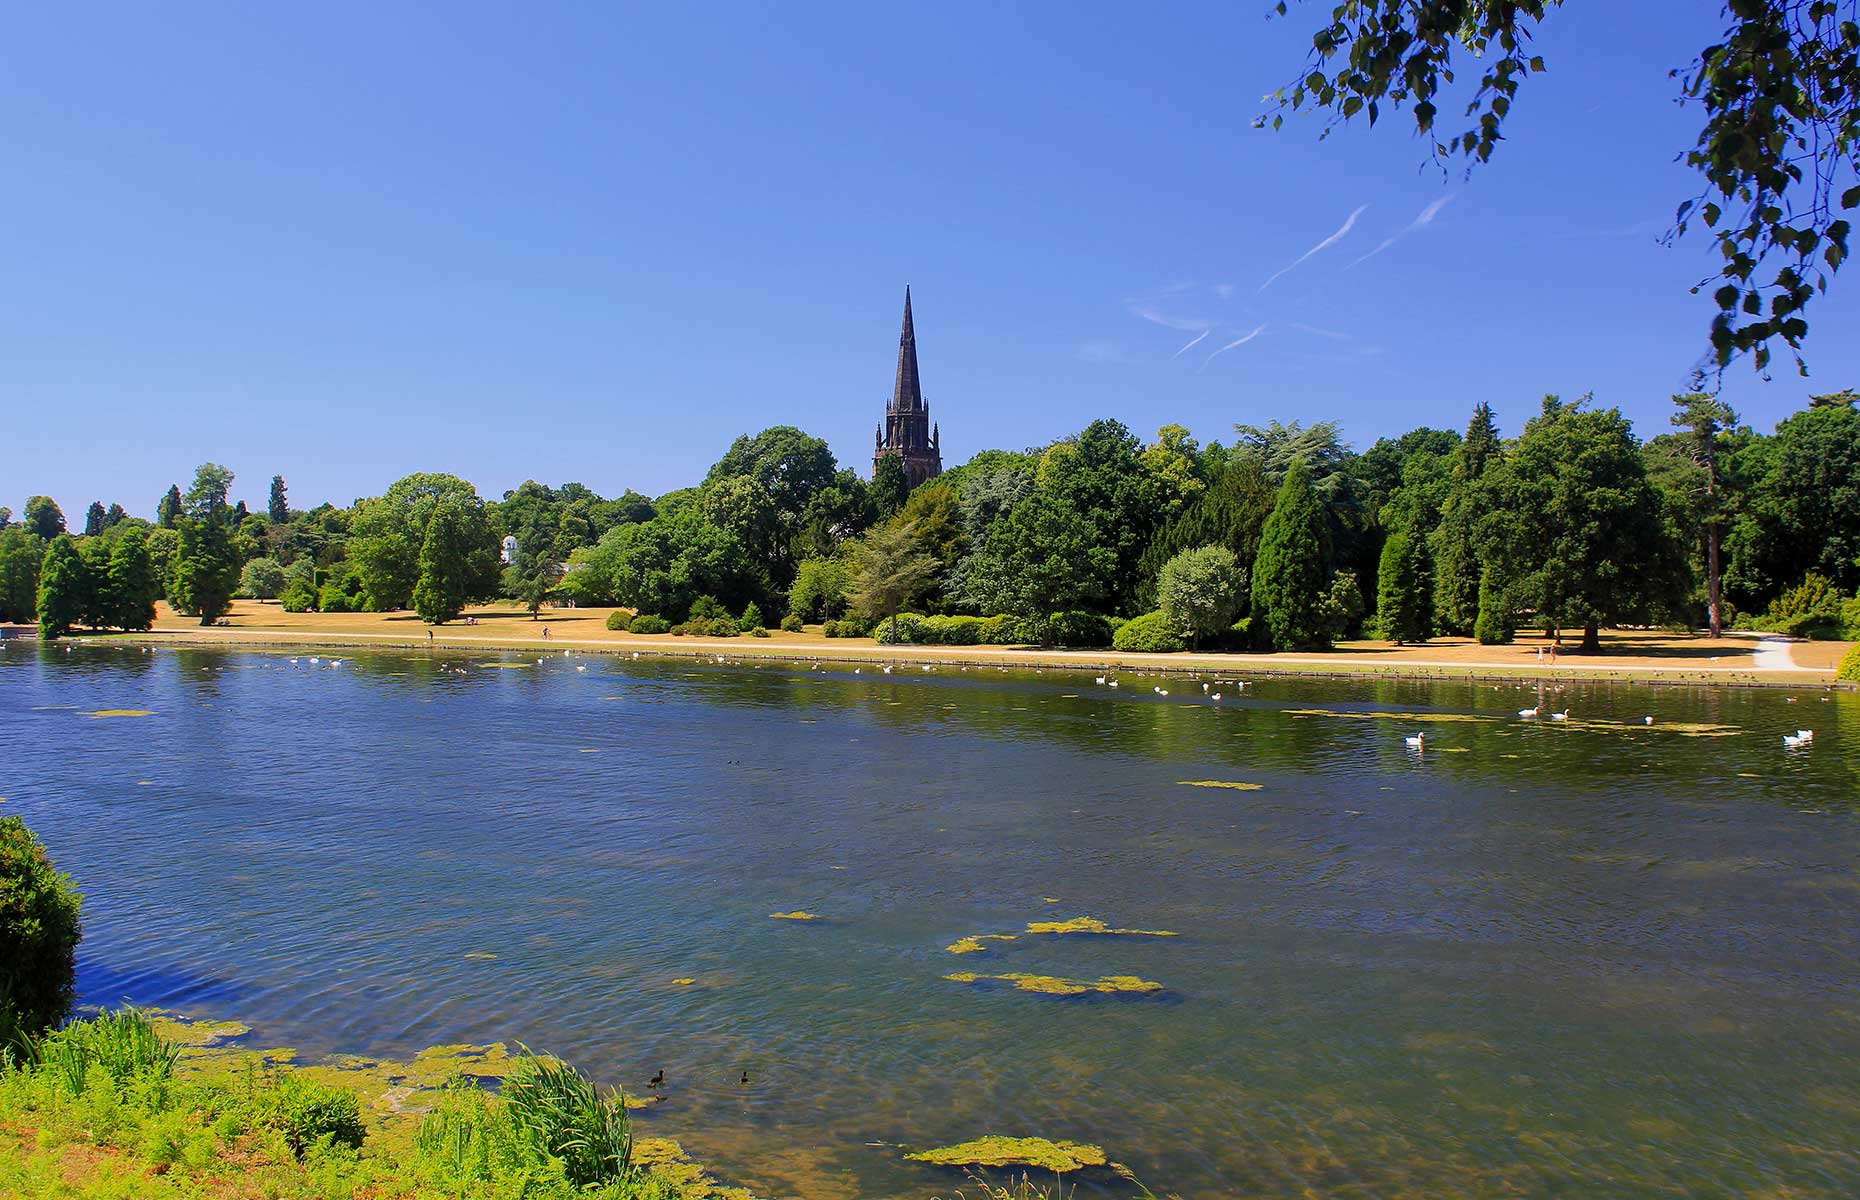 Clumber Park (Image: Kingswell Pix/Shutterstock)